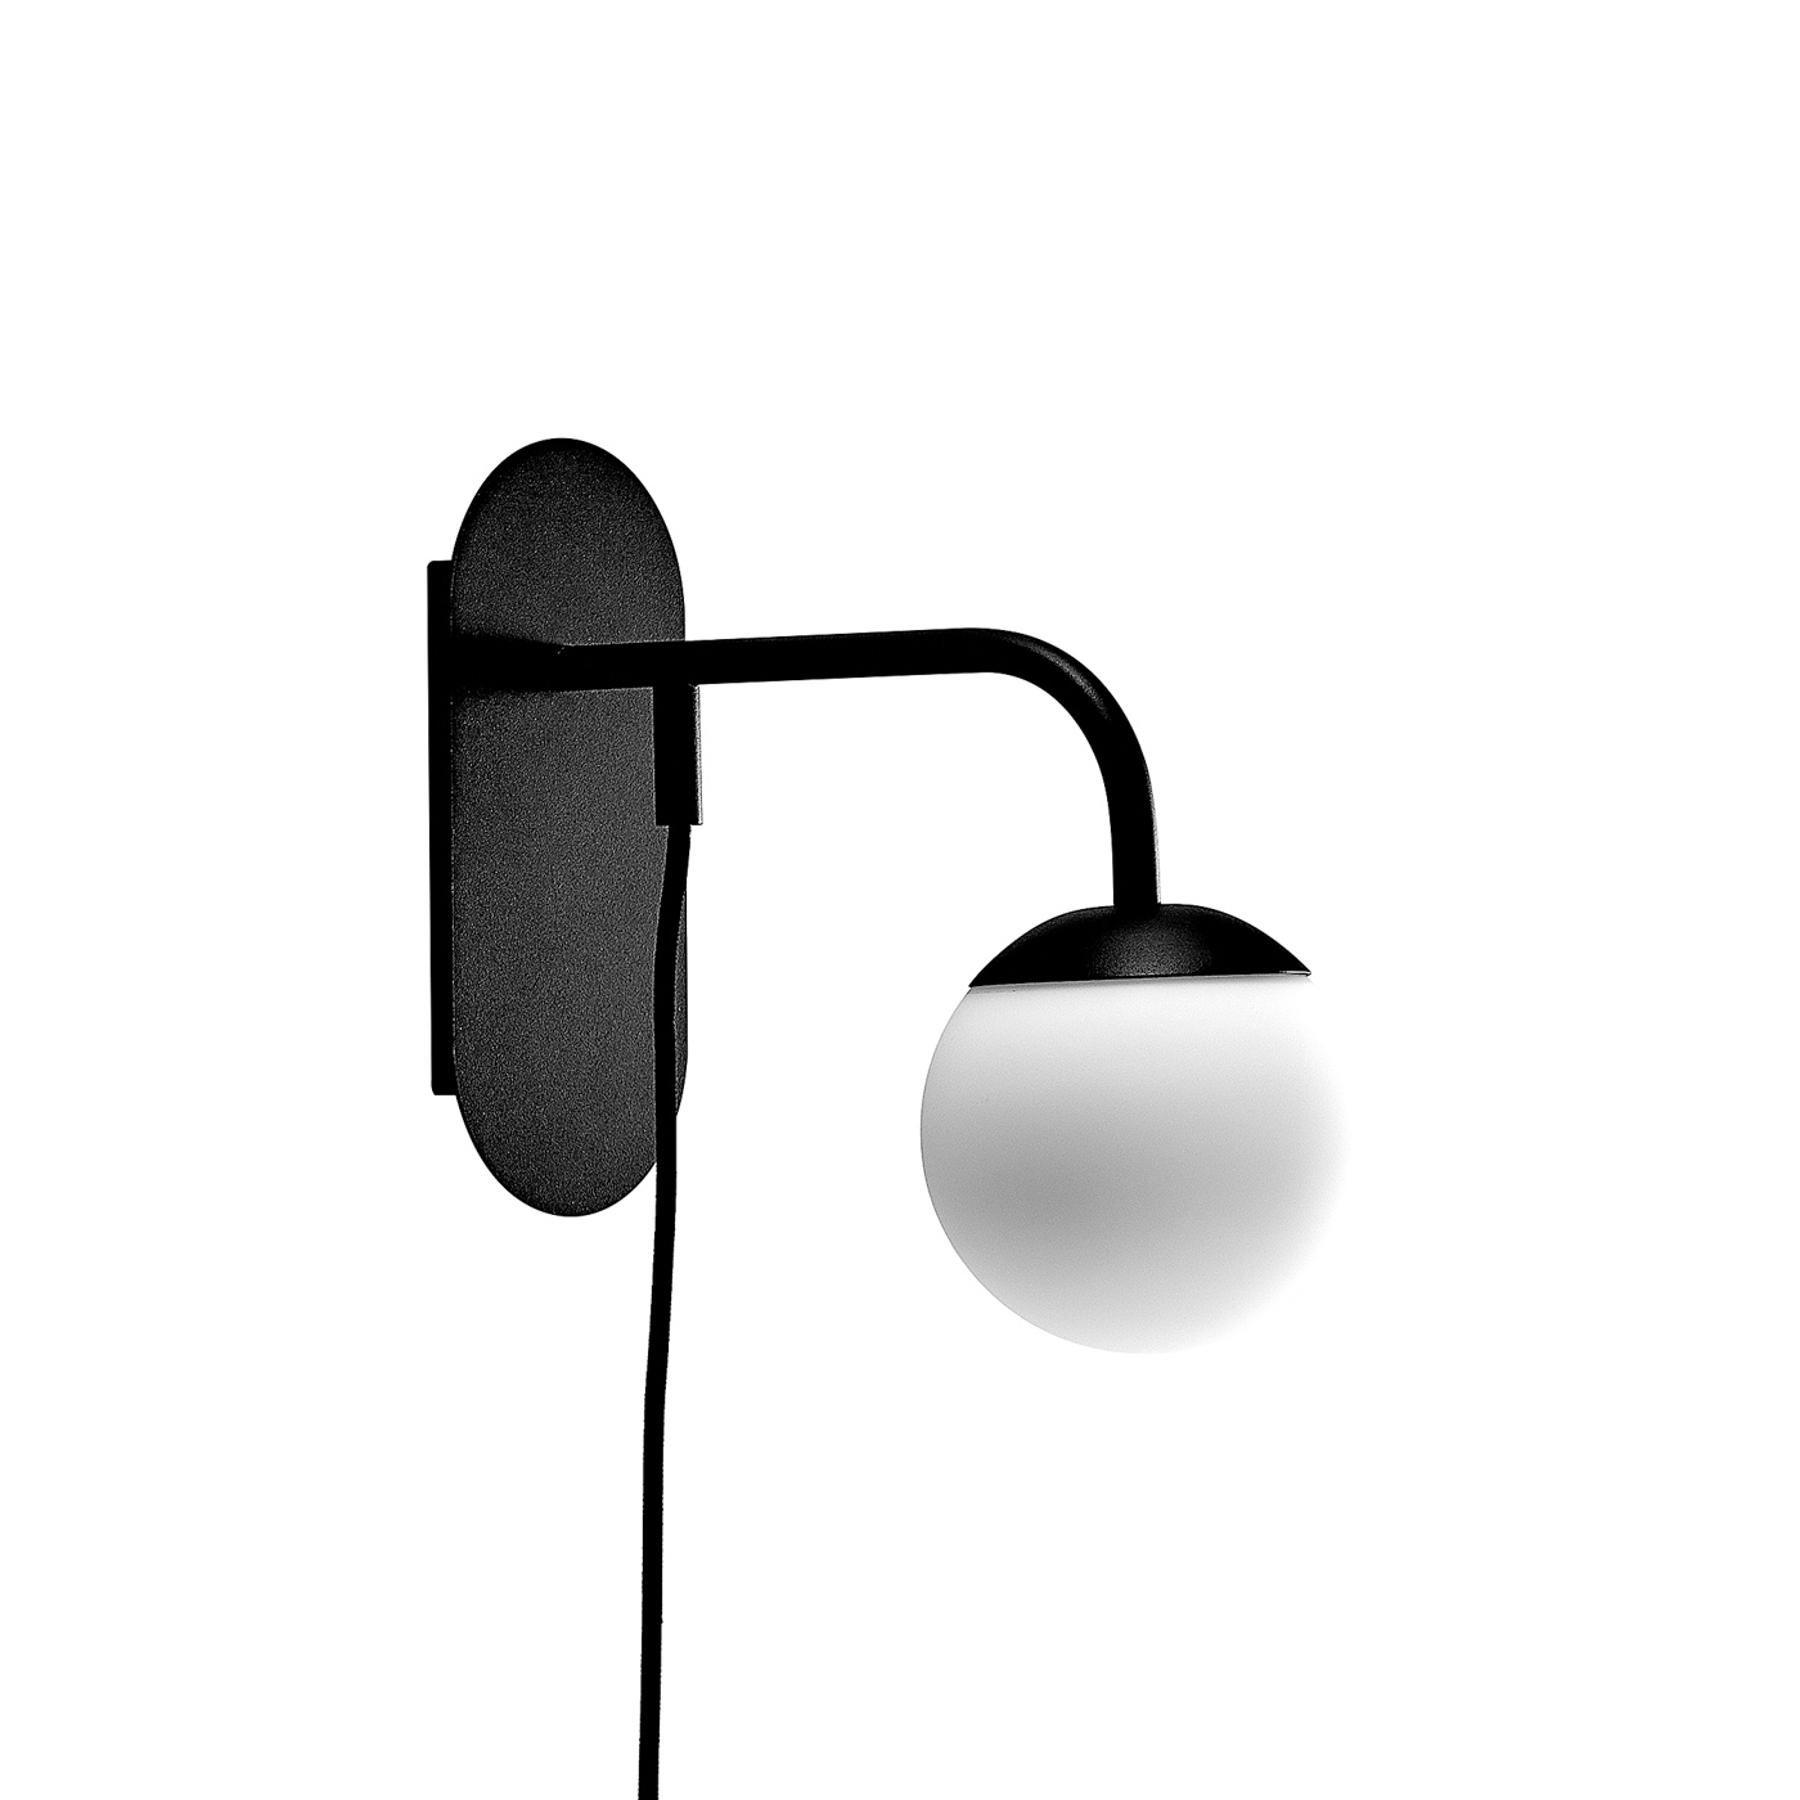 Lucande Rama LED-Wandleuchte mit Glas-Lampenschirm